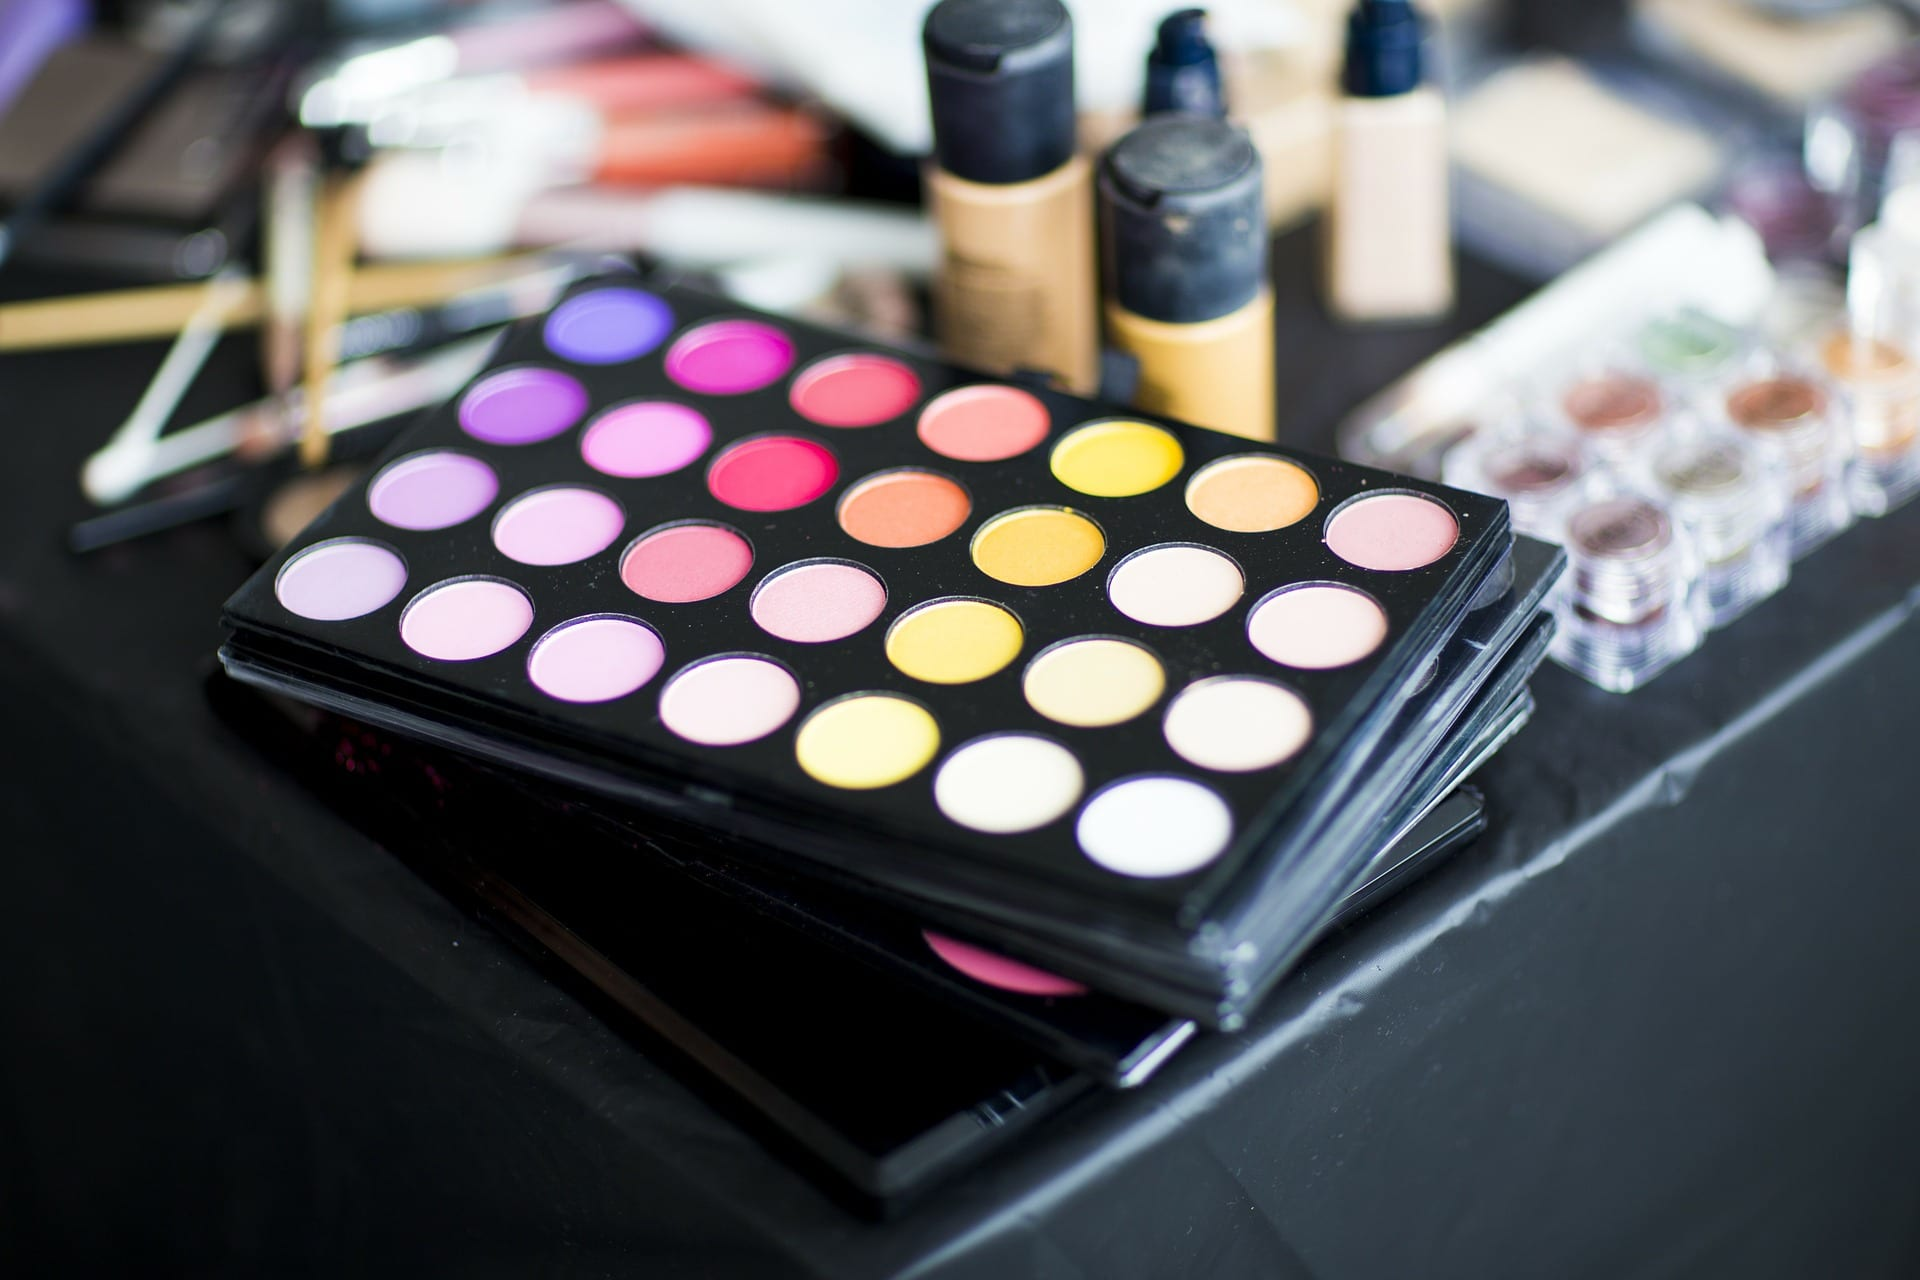 Makeup, clothing, alcohol sales shattered under pandemic: Survey